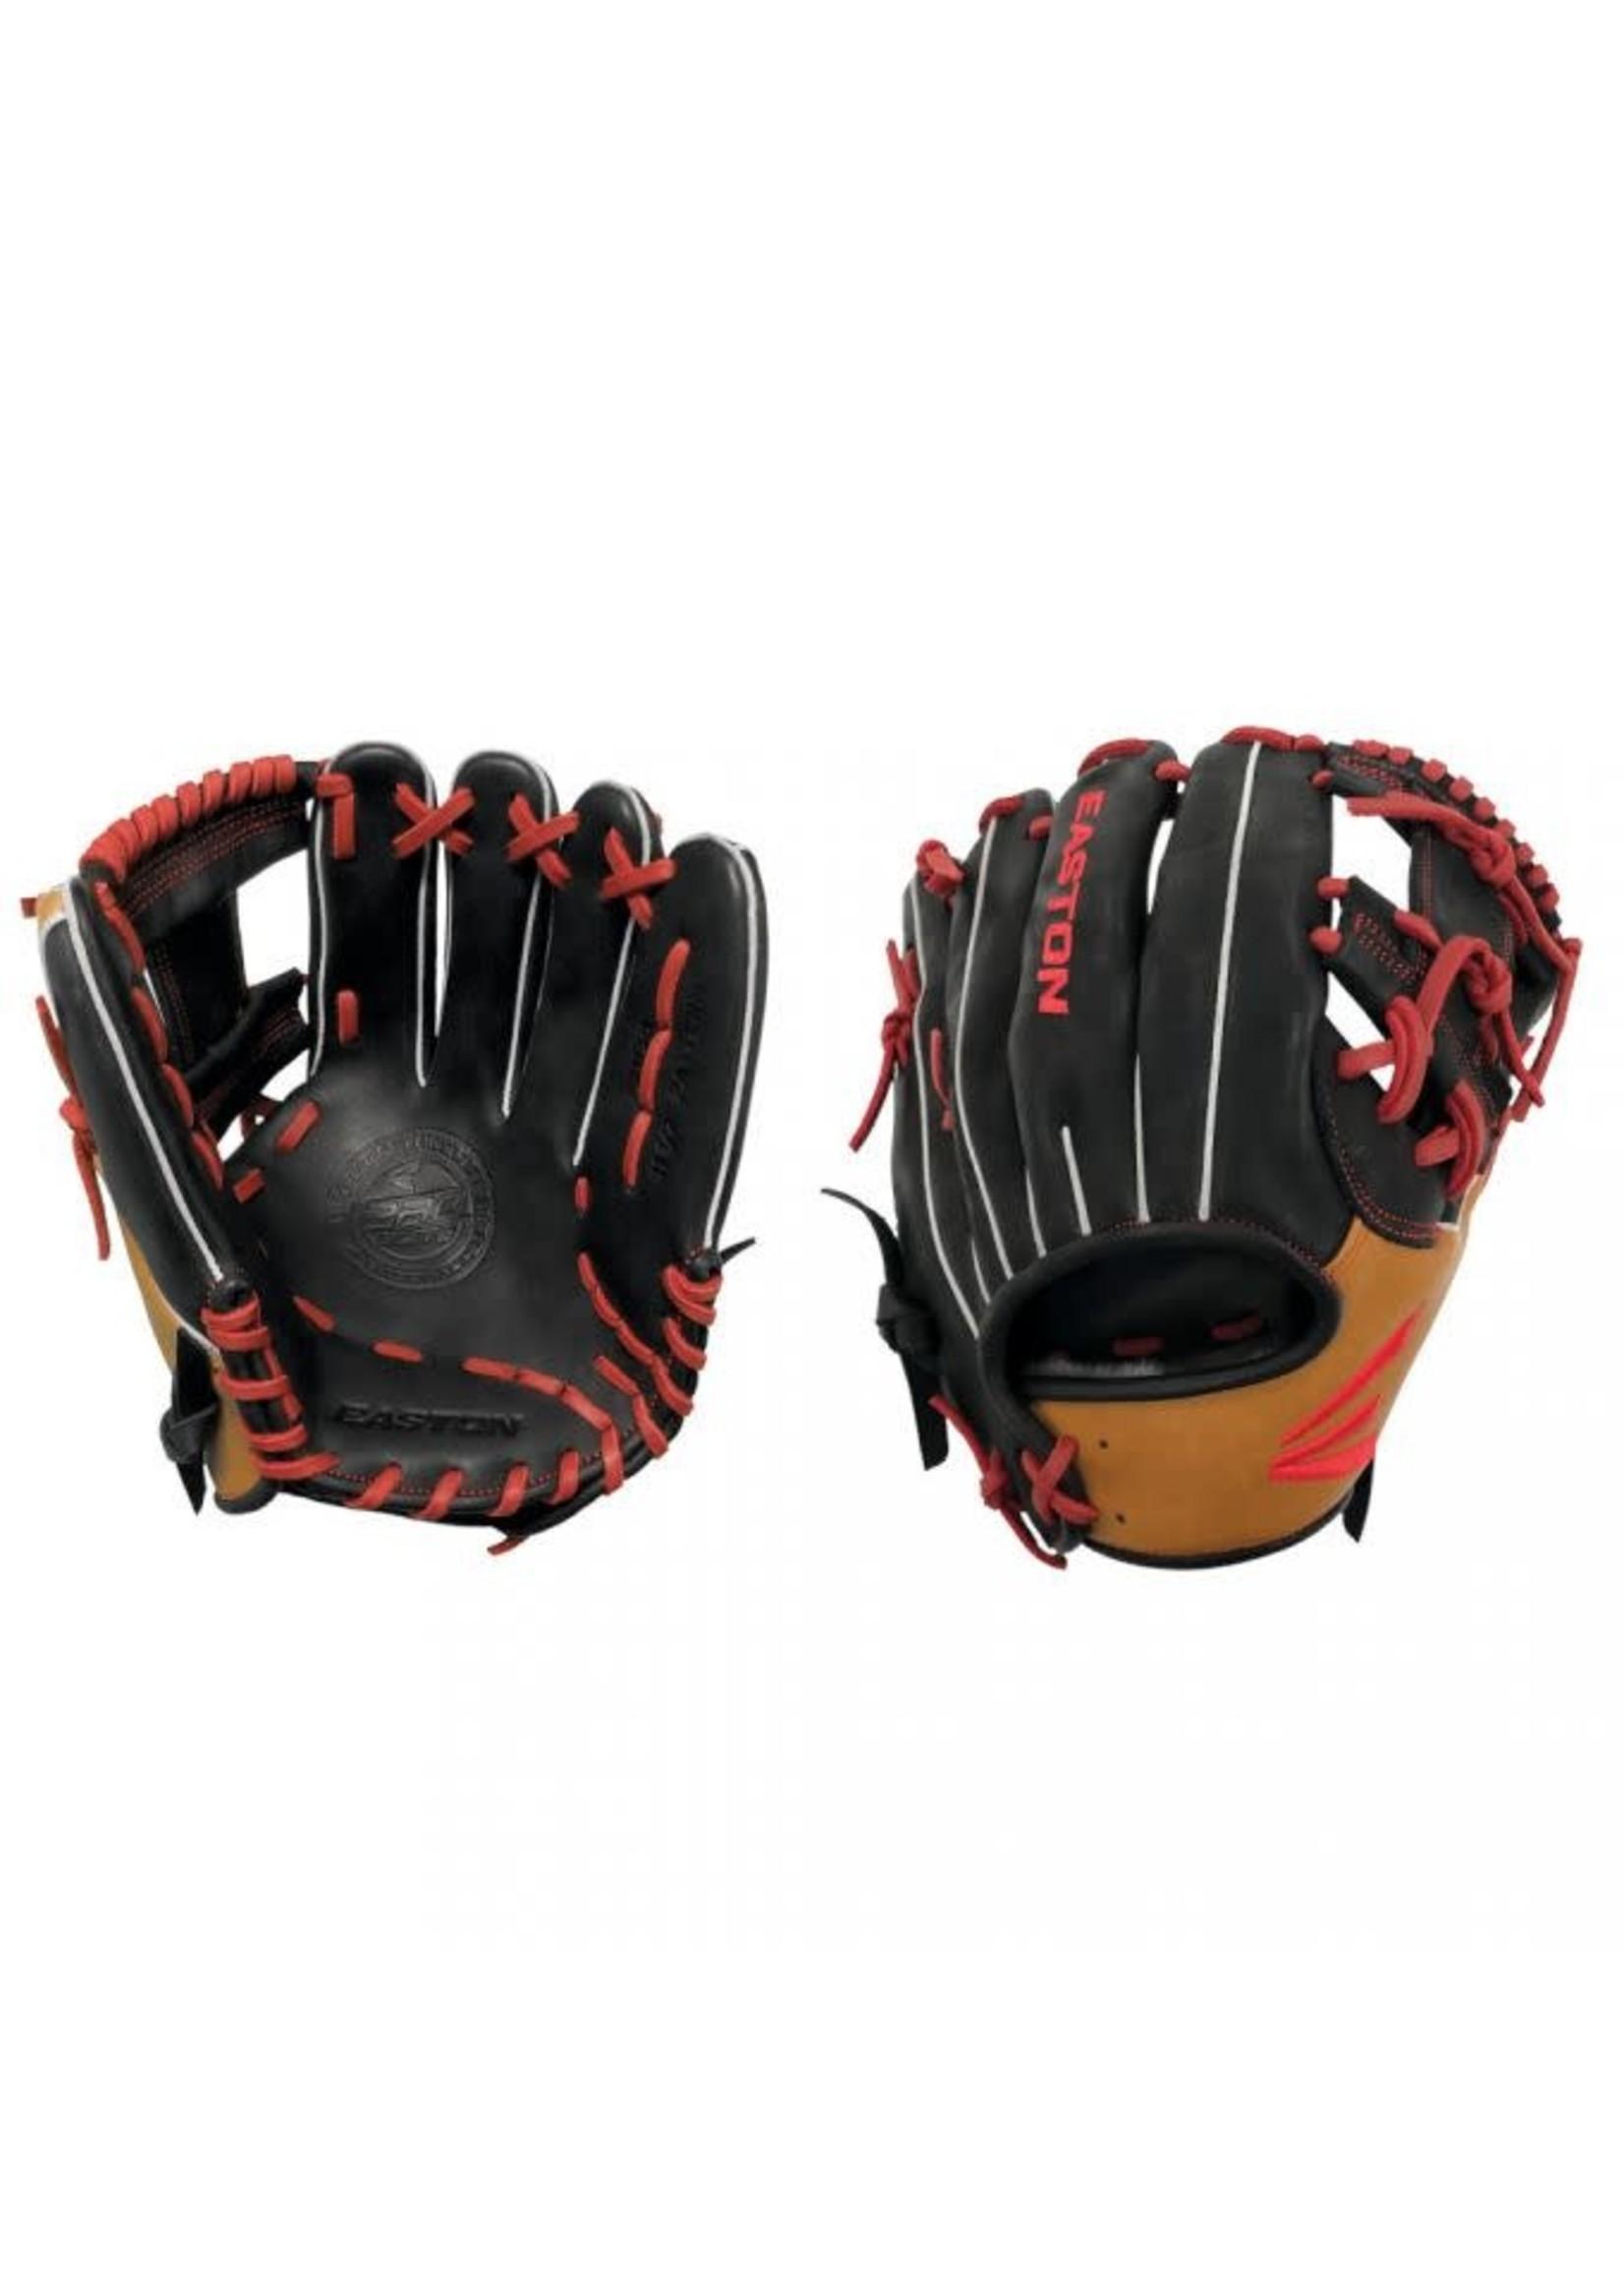 Easton Baseball (Canada) EASTON PRO ELITE BB EP1150 11.5 IN I WEB